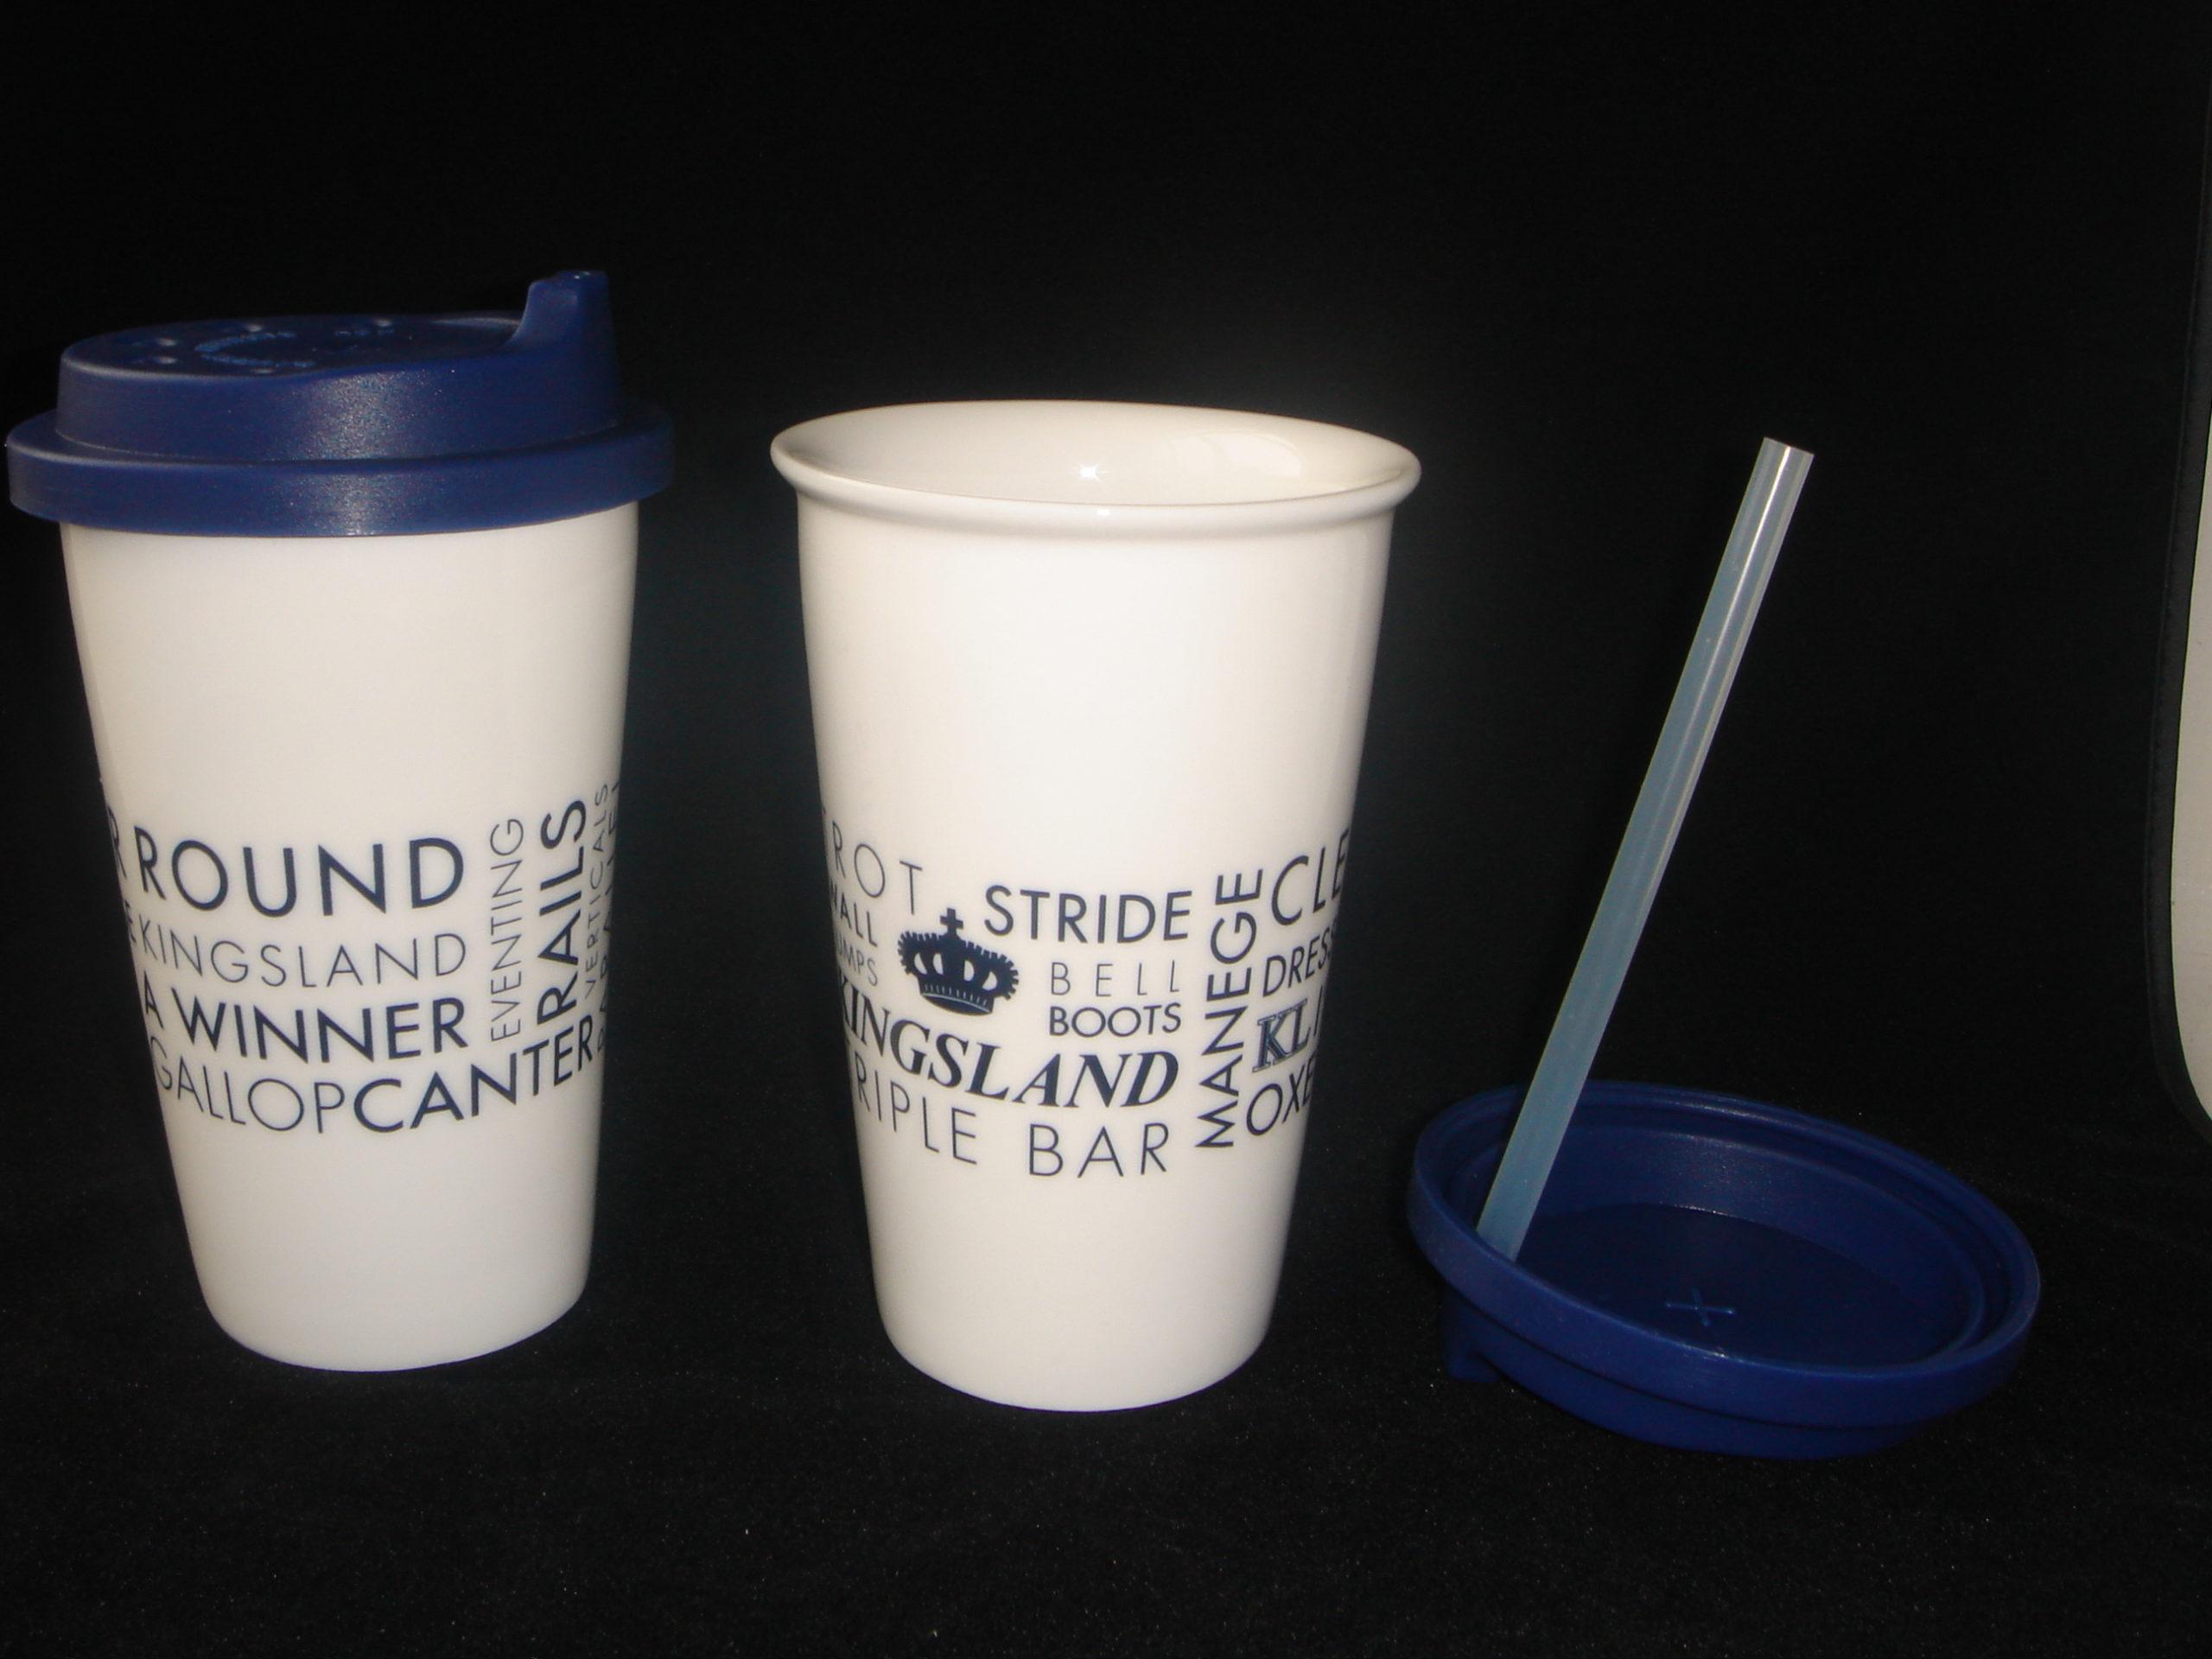 Mugs for Kingsland I